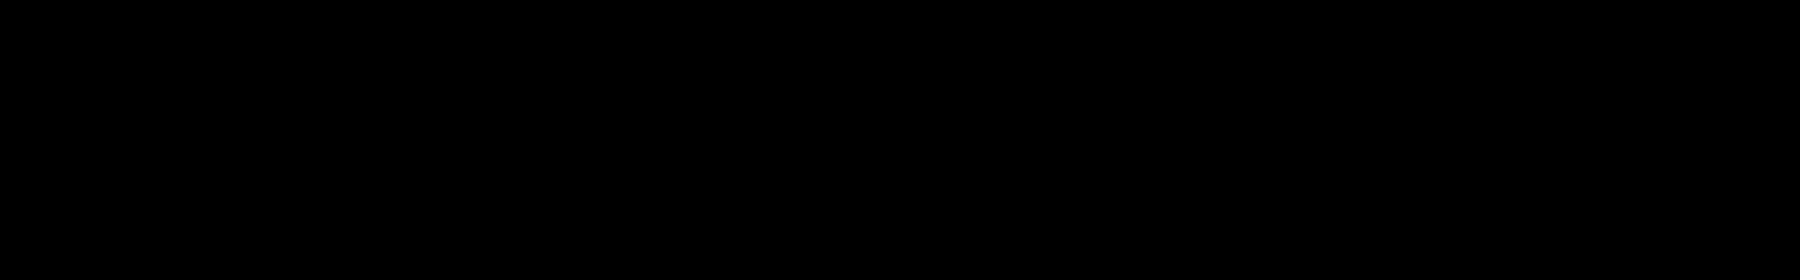 Modern Reggaeton audio waveform